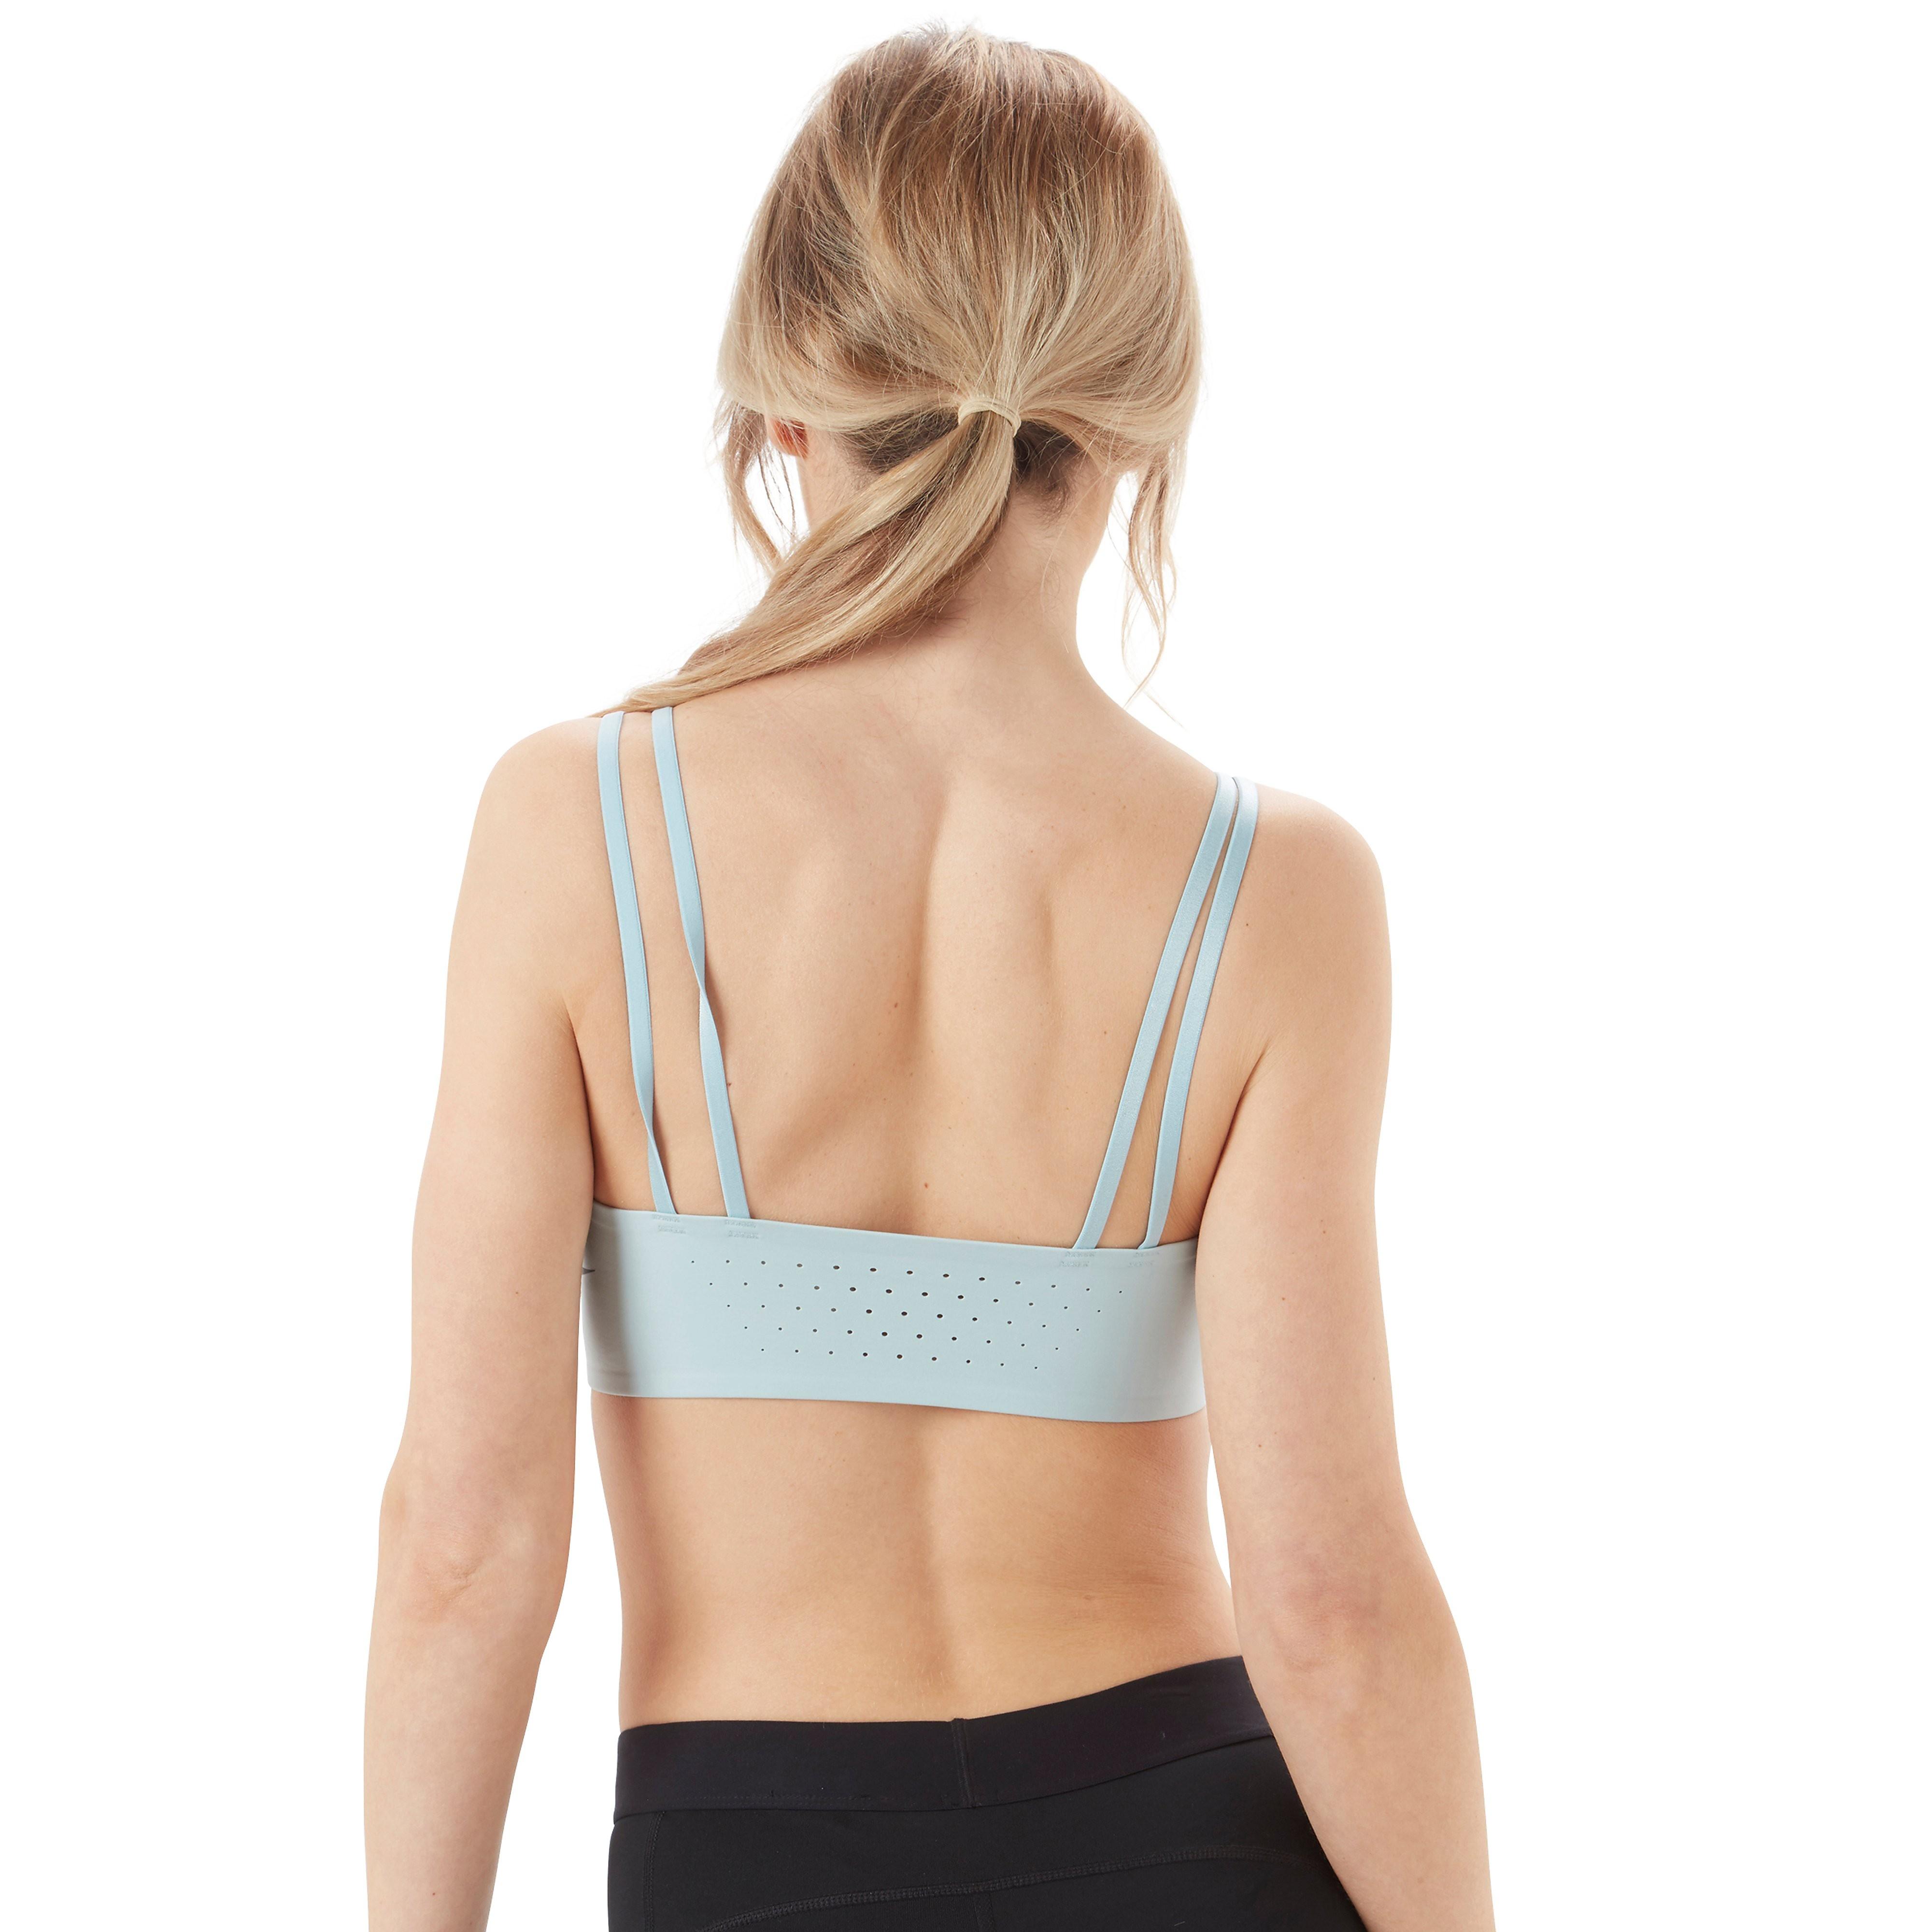 Nike Indy Breathe Women's Training Bra